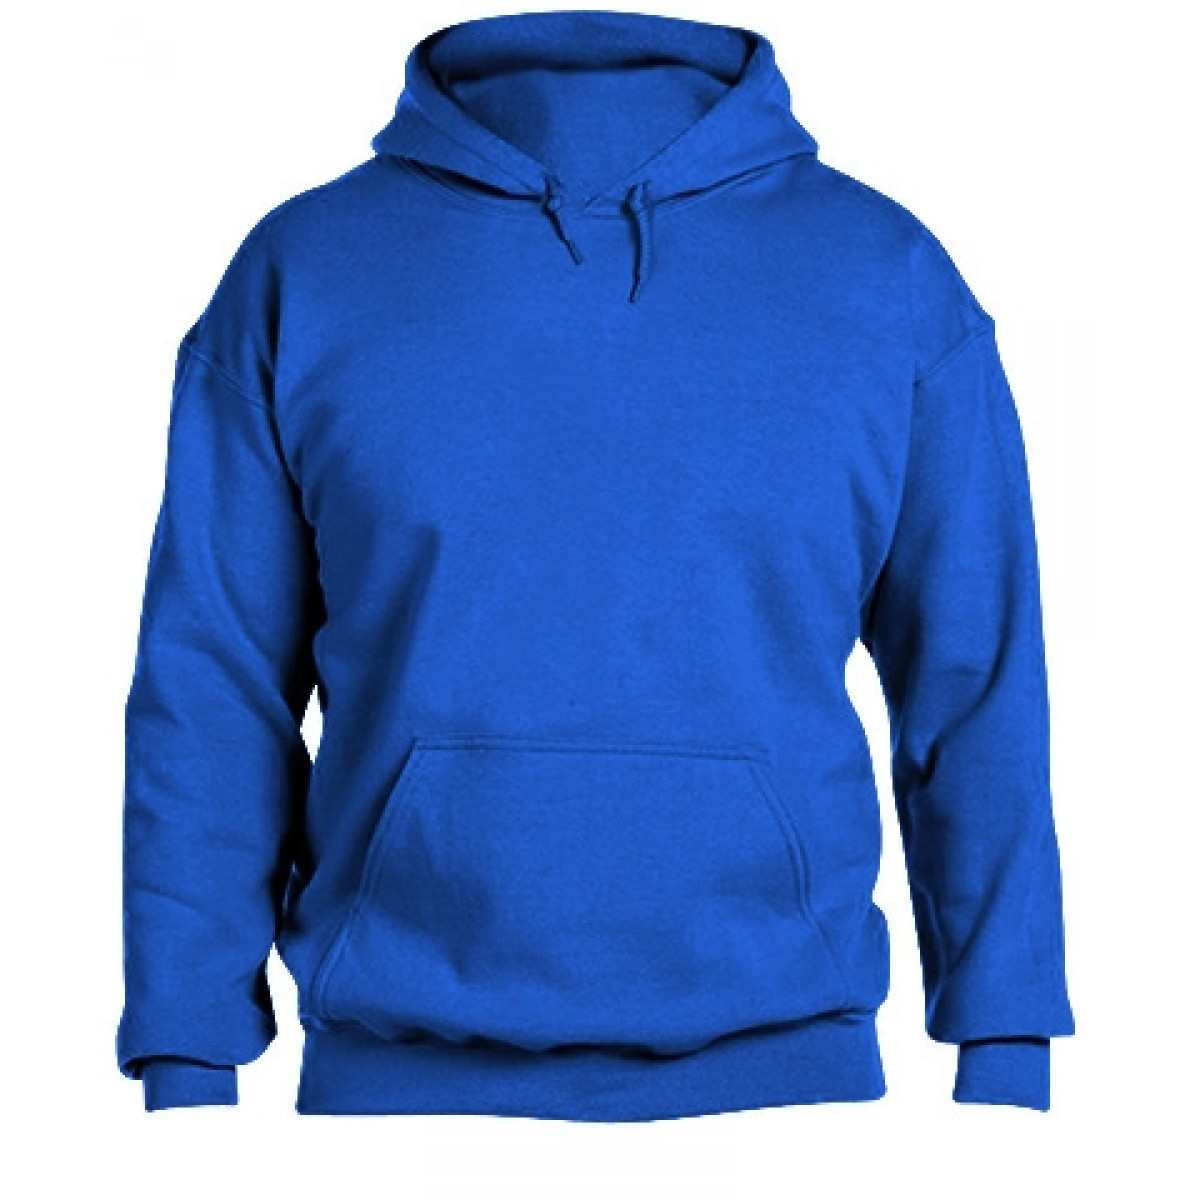 Solid Hooded Sweatshirt  50/50 Heavy Blend-Royal Blue-M